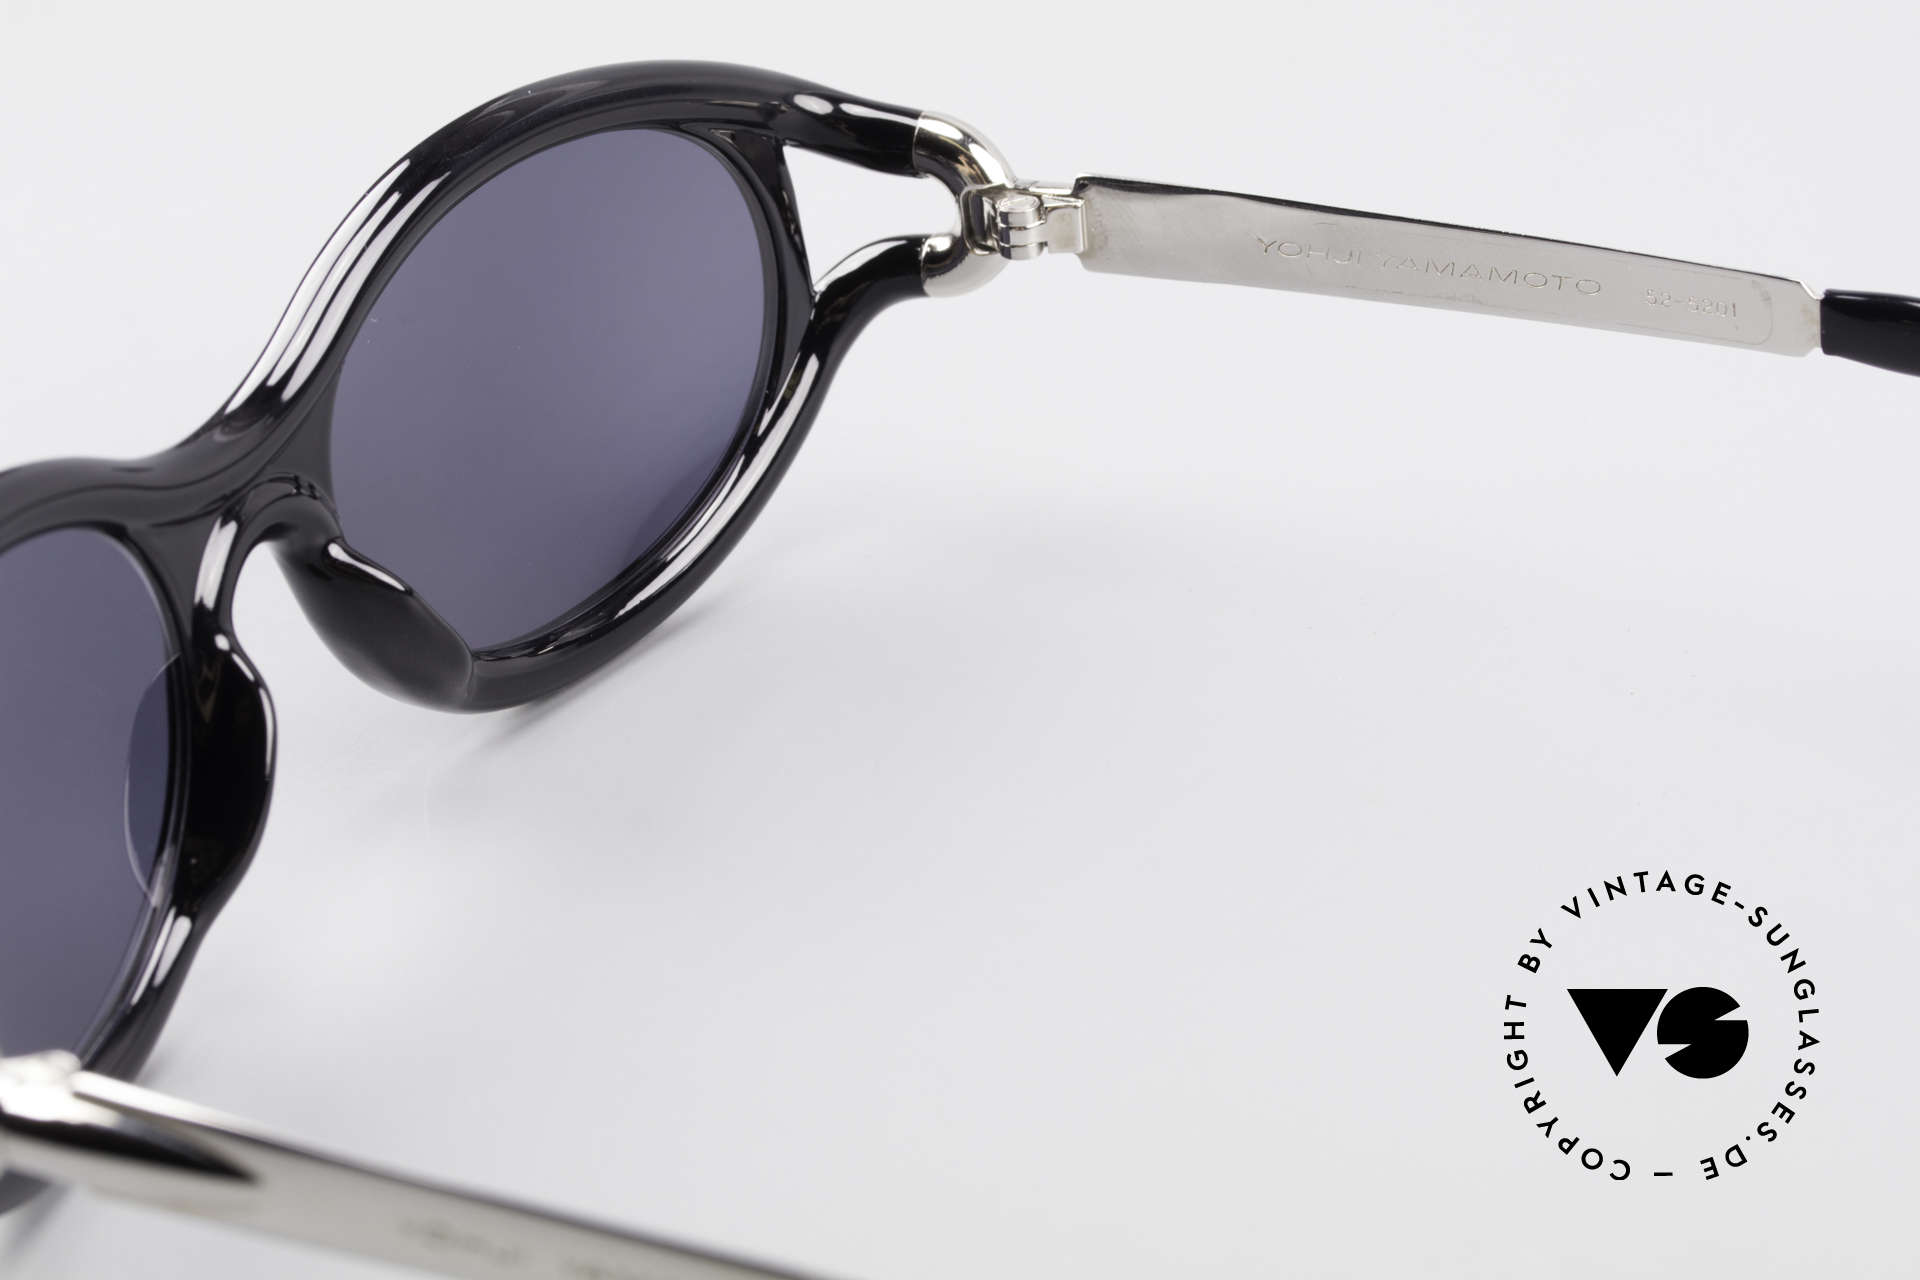 Yohji Yamamoto 52-5201 Designer Shades Made in Japan, Size: medium, Made for Men and Women